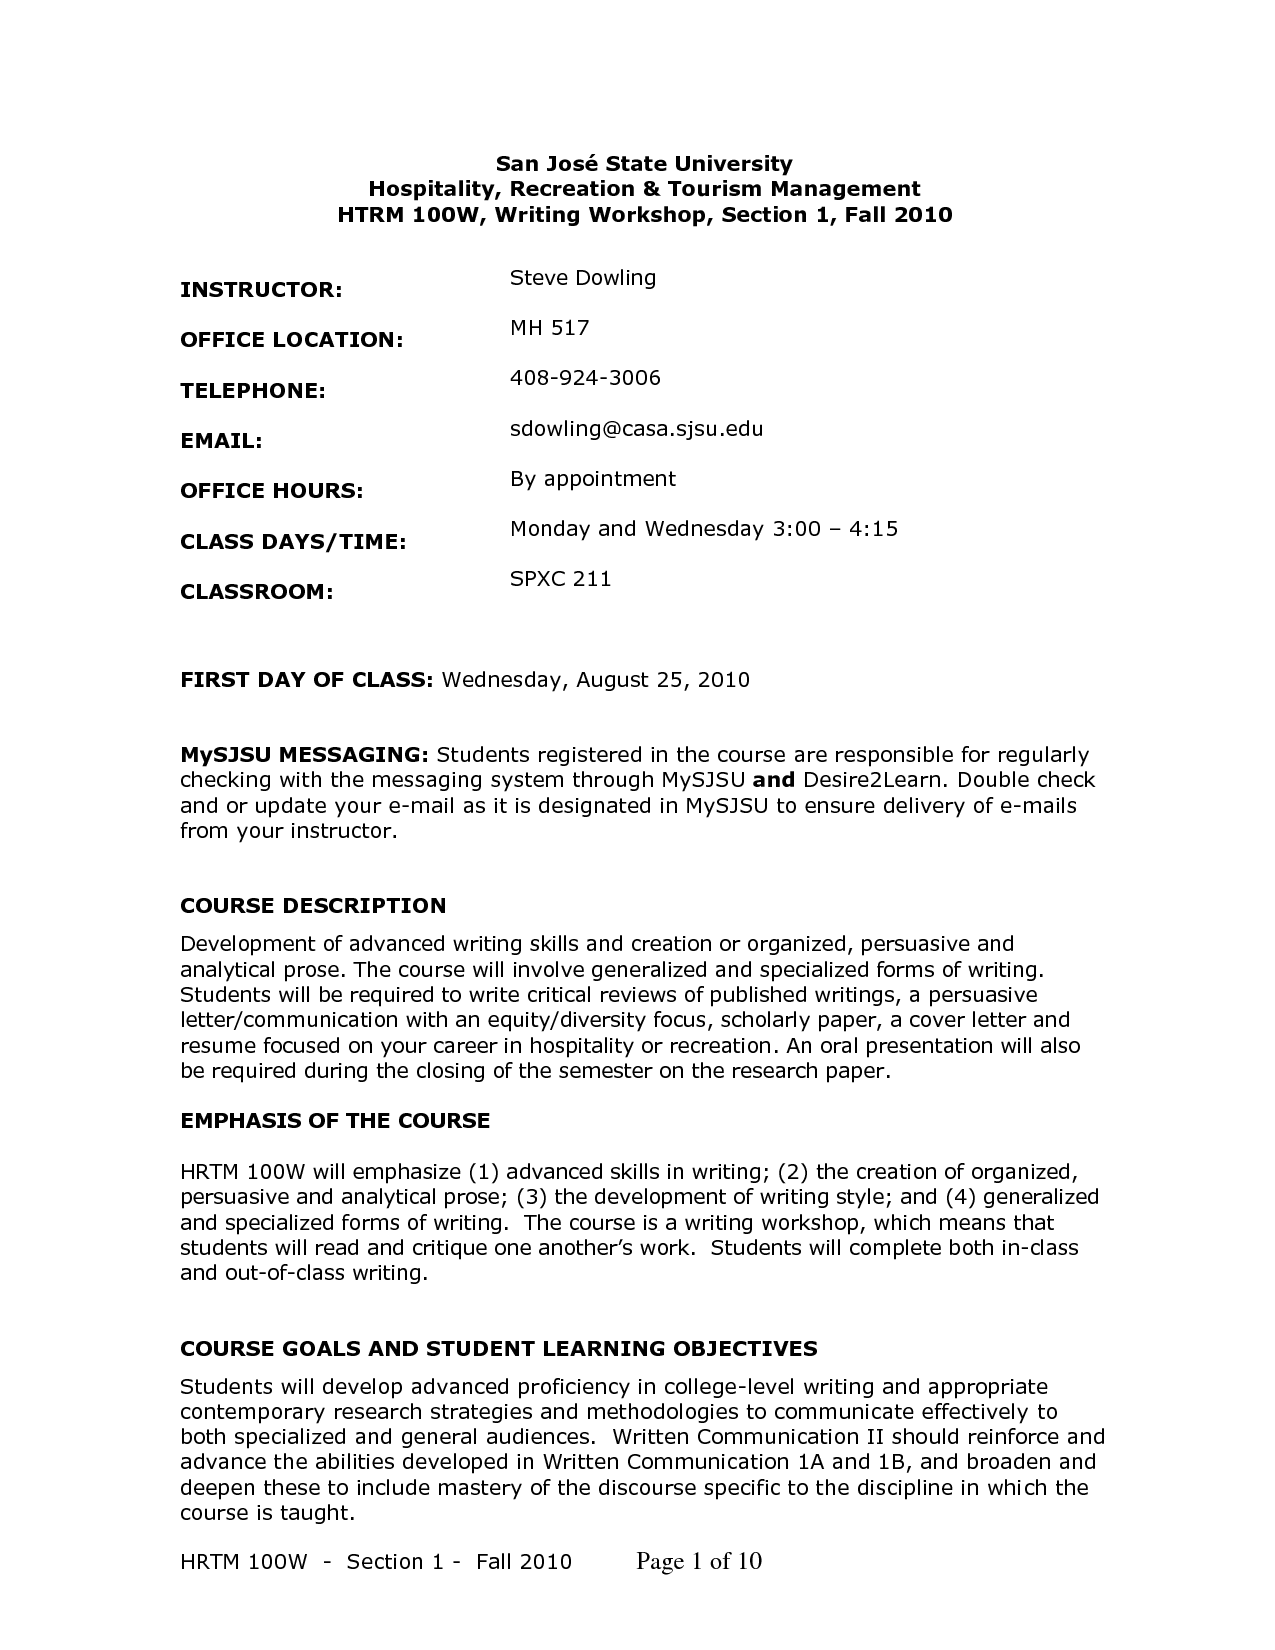 011 Academic Essays Essay Example Apa College Paper Magnificent Database Examples Pdf Full